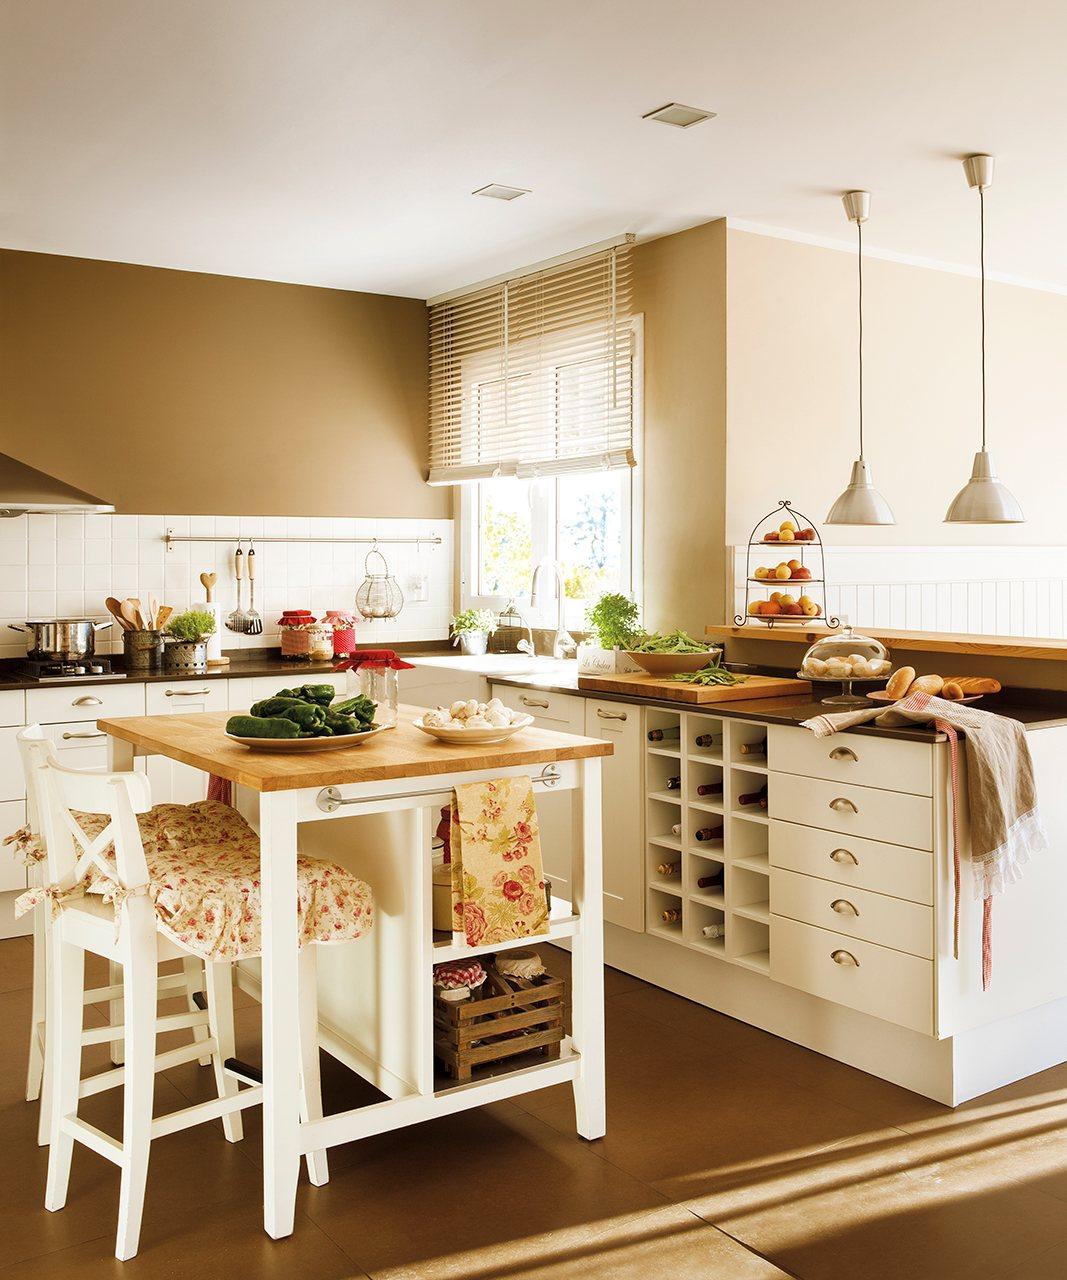 Muebles De Cocina En Ikea Murcia – Lakelouise.info